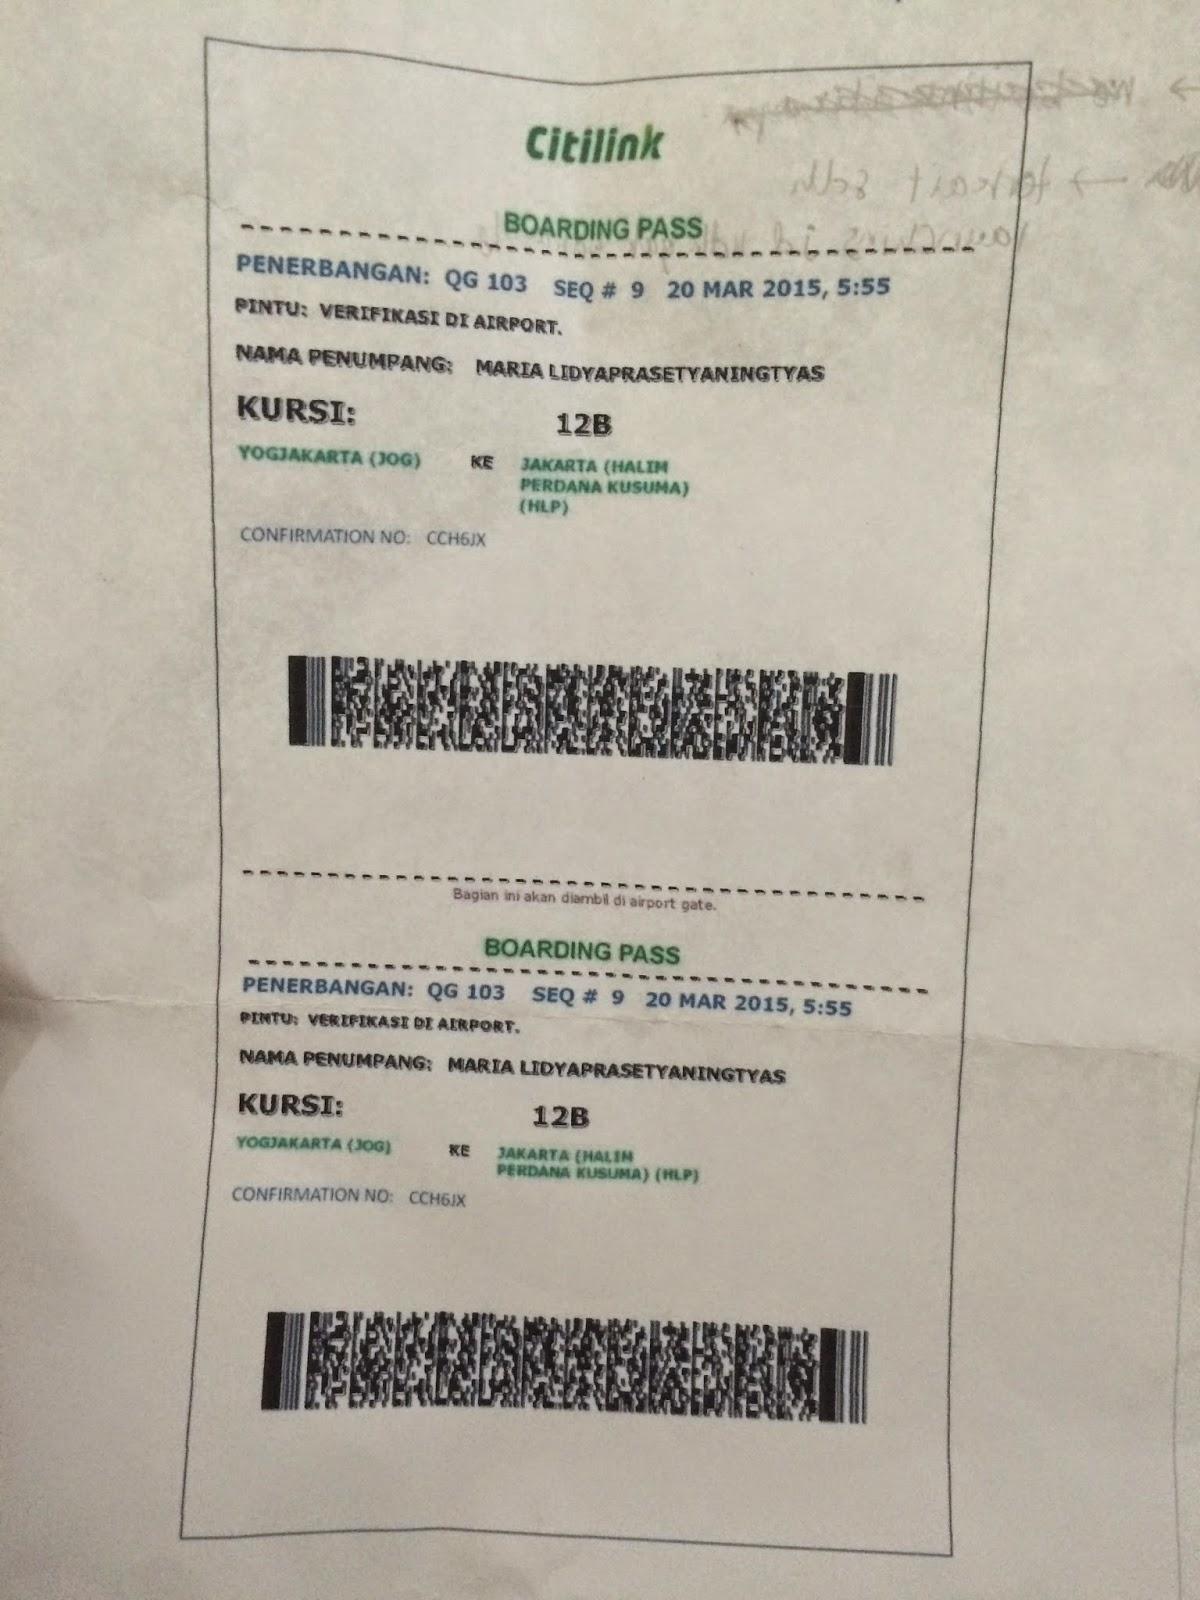 cara naik pesawat jogja jakarta rh marialydiap blogspot com harga tiket pesawat jakarta jogja via halim Tiket Pesawat Jakarta Batam Pp